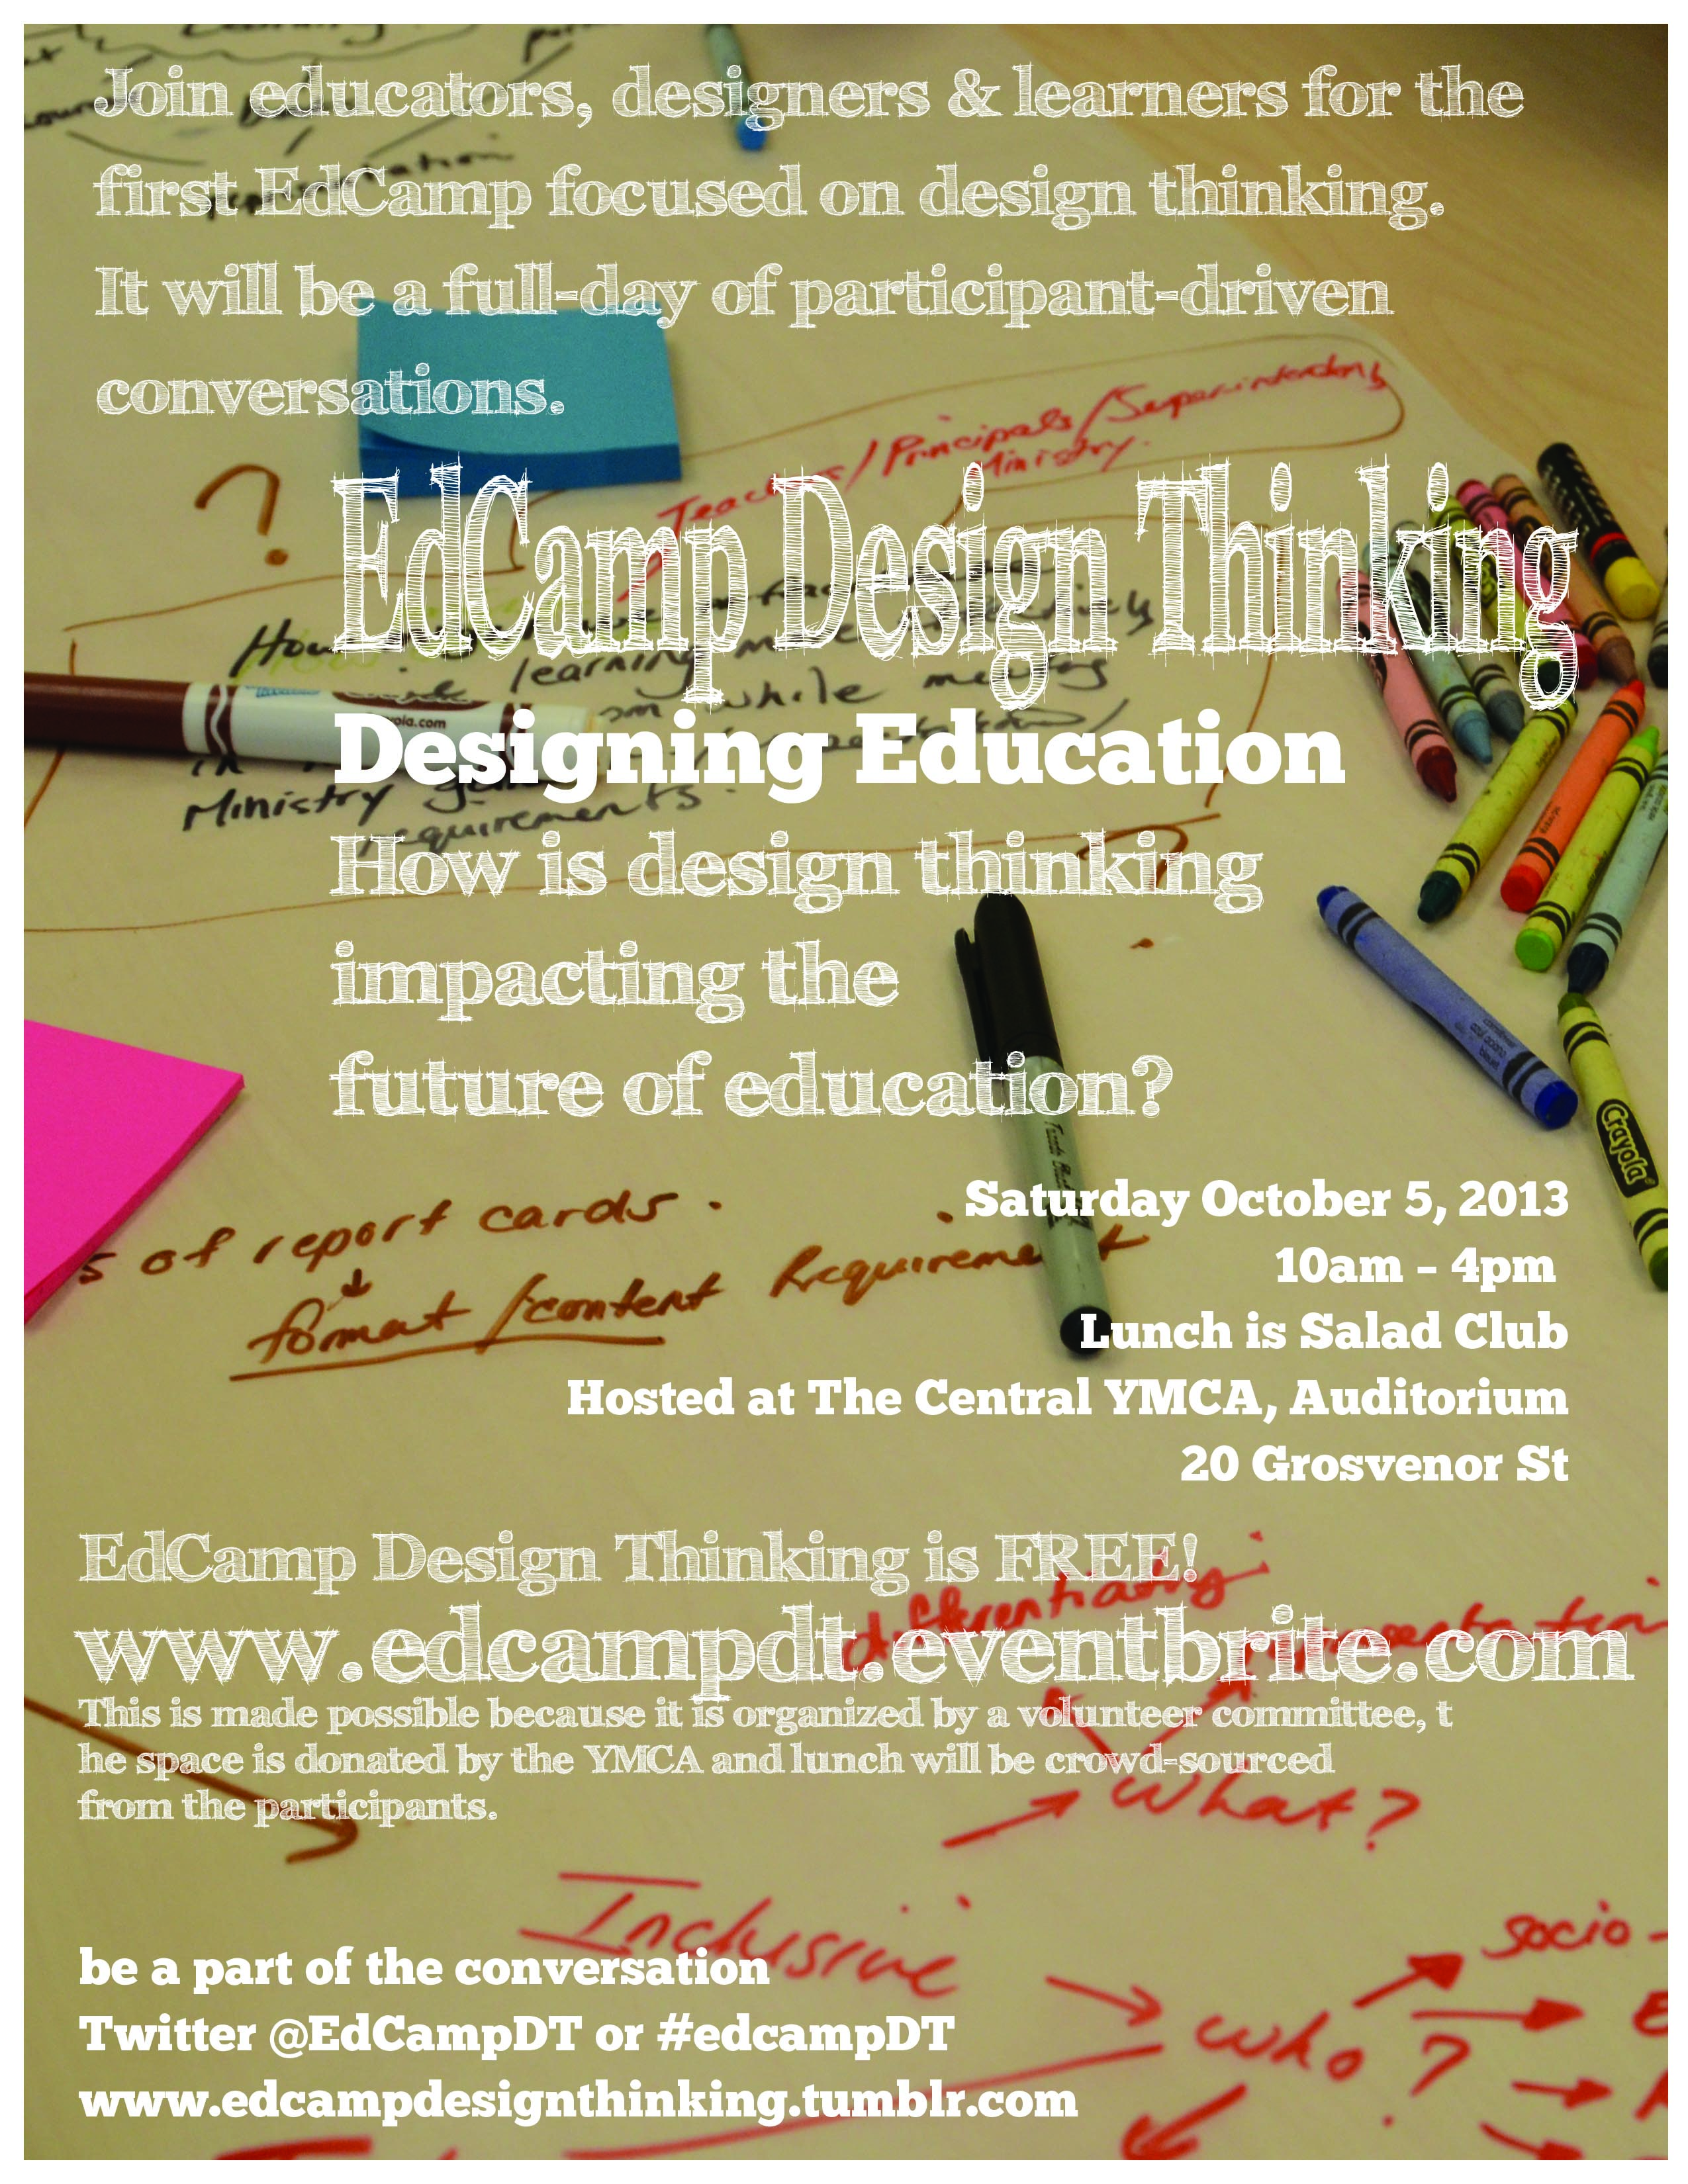 Edcamp Toronto Design Thinking Poster.